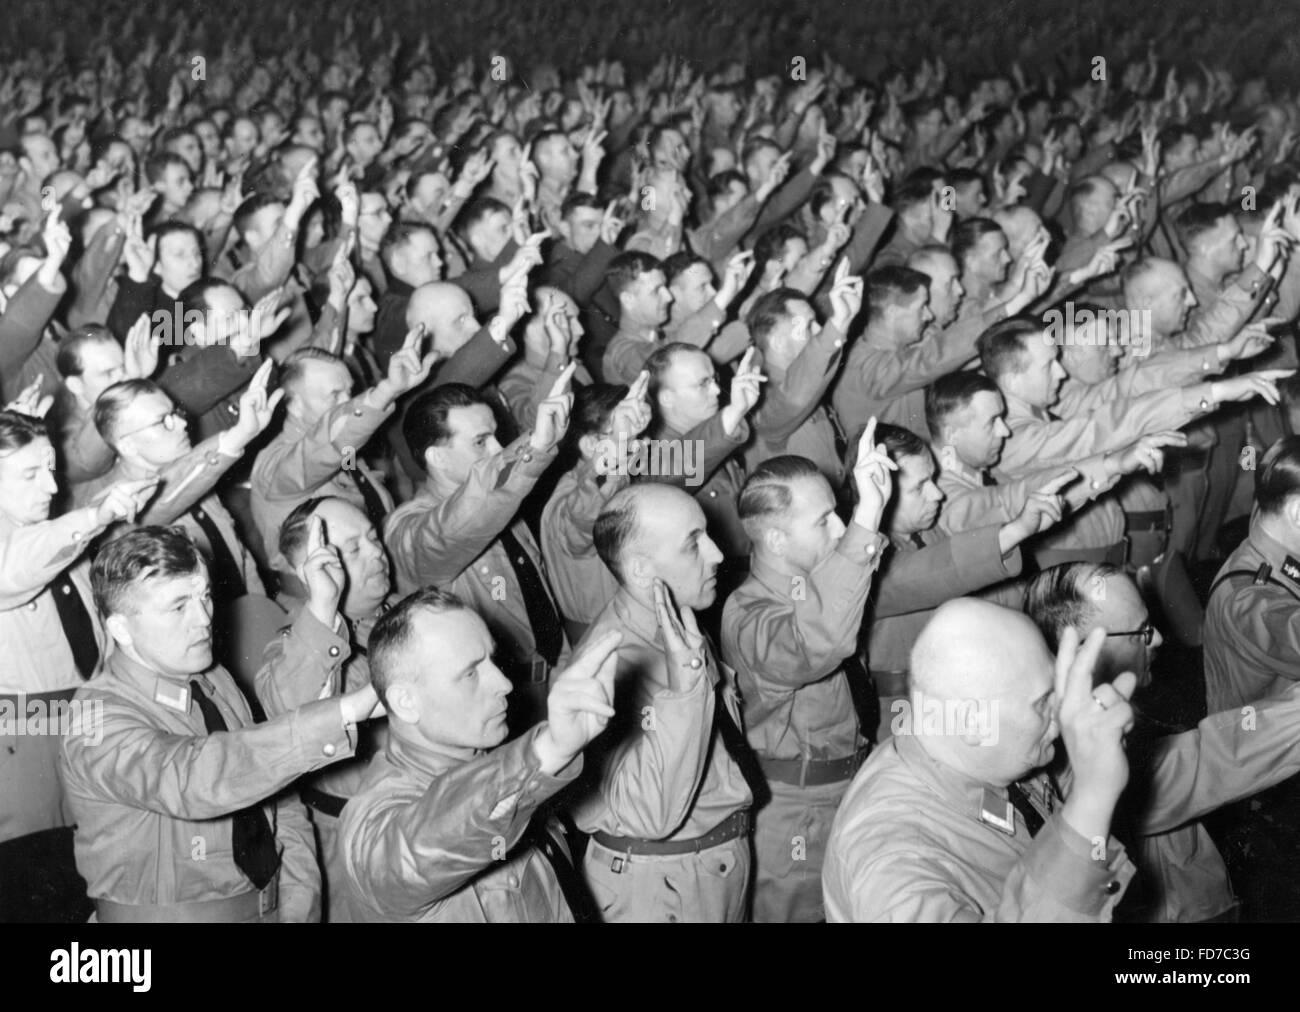 Swearing in of political leaders in Berlin, 1939 - Stock Image